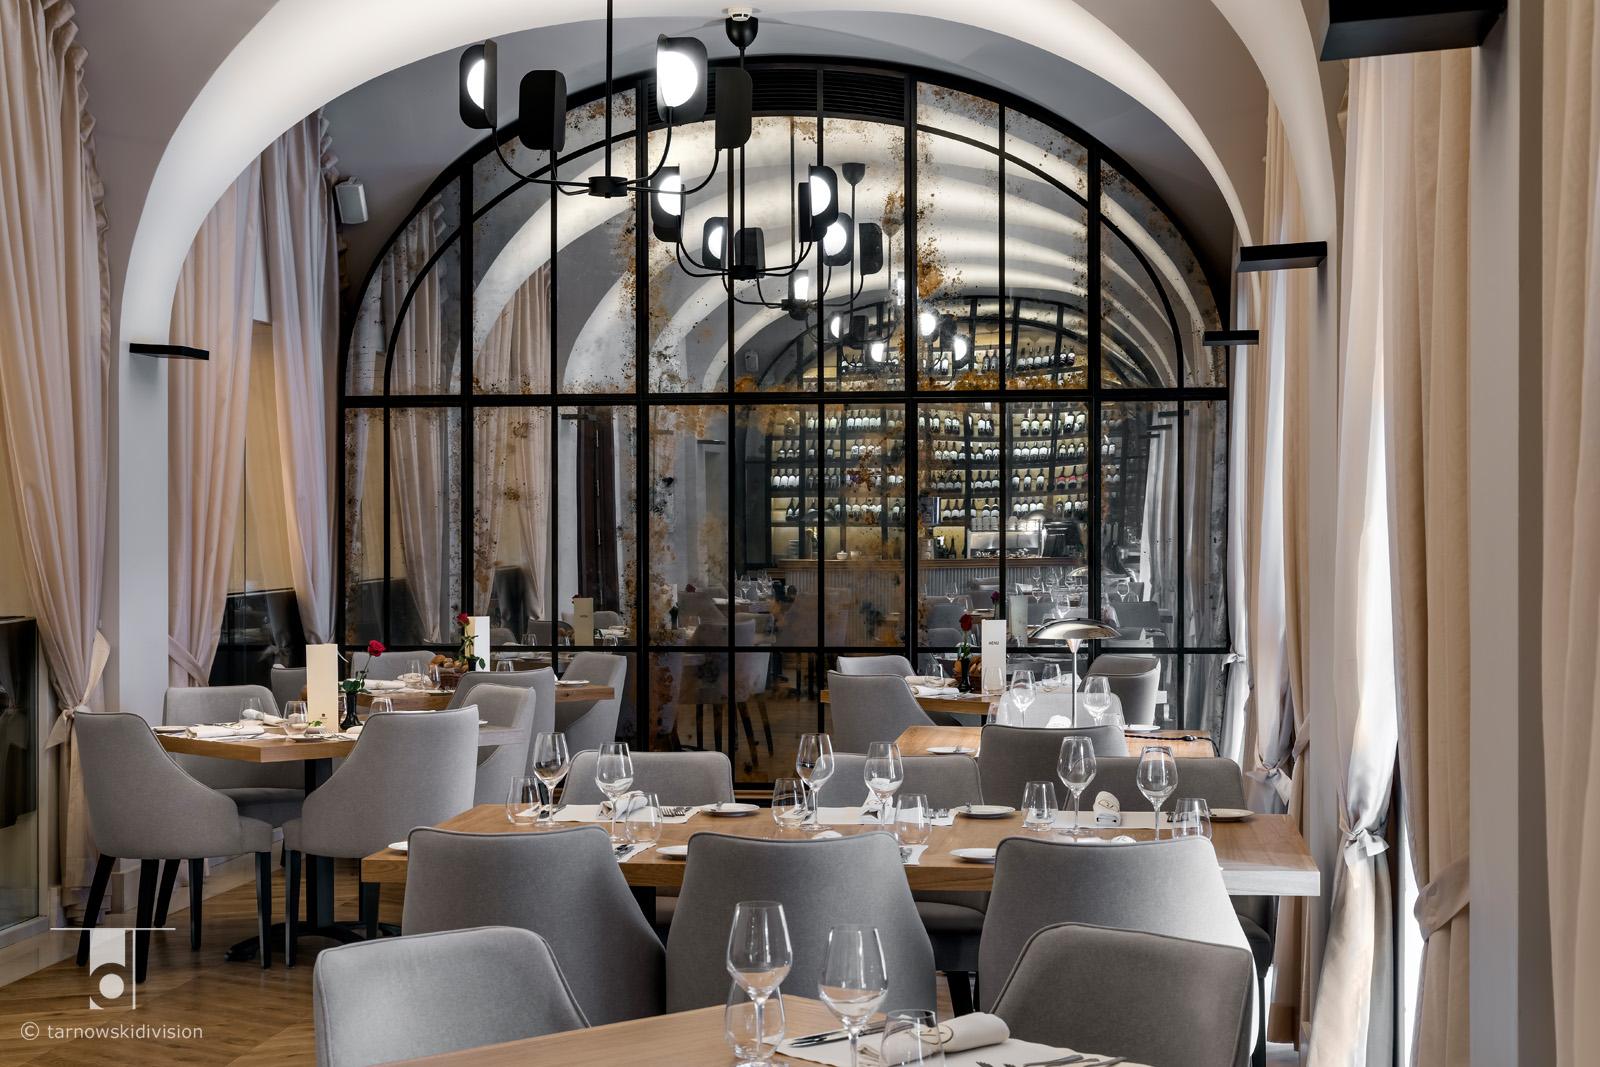 wnętrze restauracji La Rotisserie Mamaison Hotel Le Regina restauracja projekt wnętrz restaurant interior design_tarnowskidivision